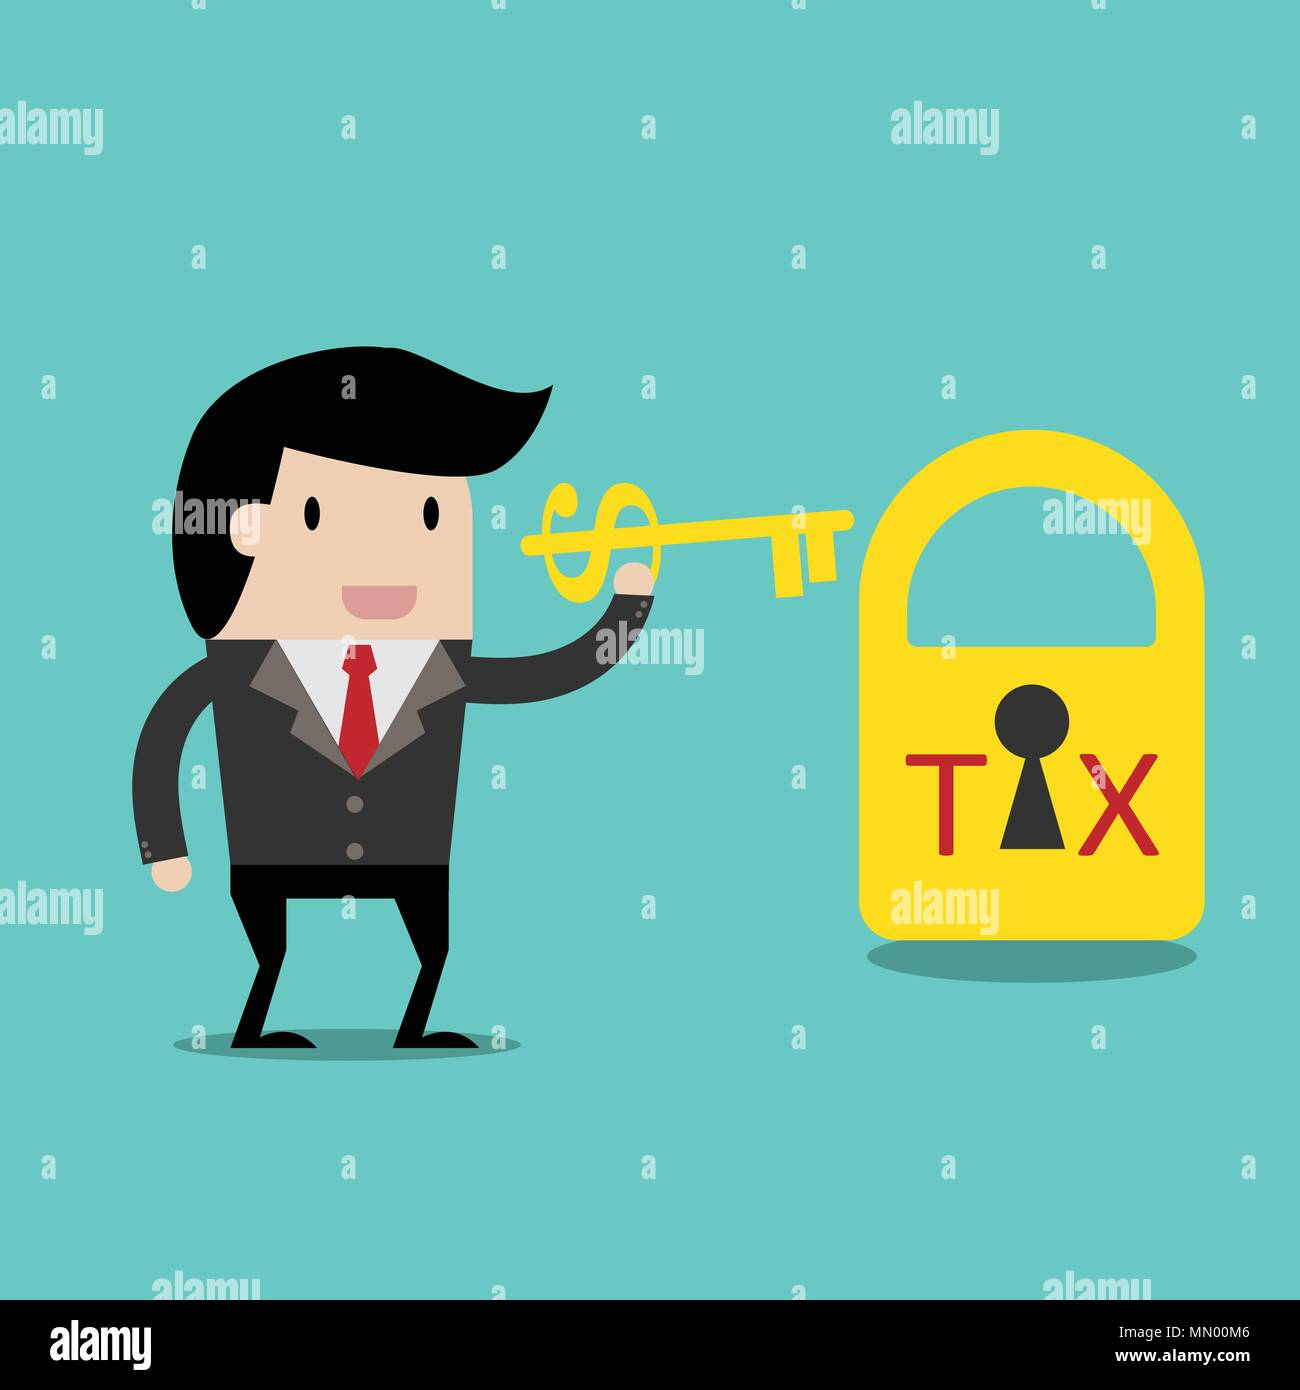 Income Tax Cartoon Stock Photos Amp Income Tax Cartoon Stock